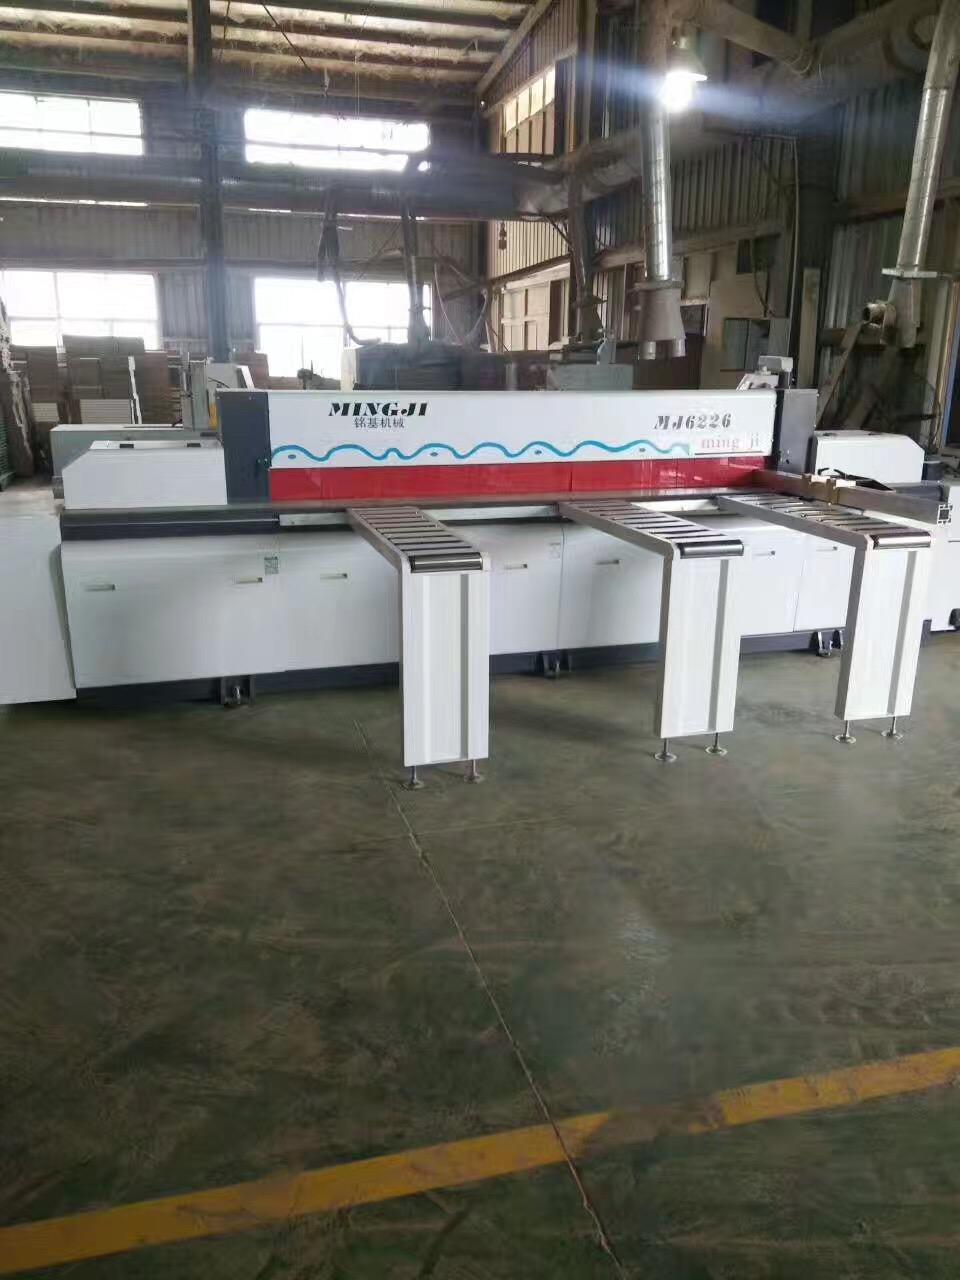 woodworking beam saw machine in customer's factory